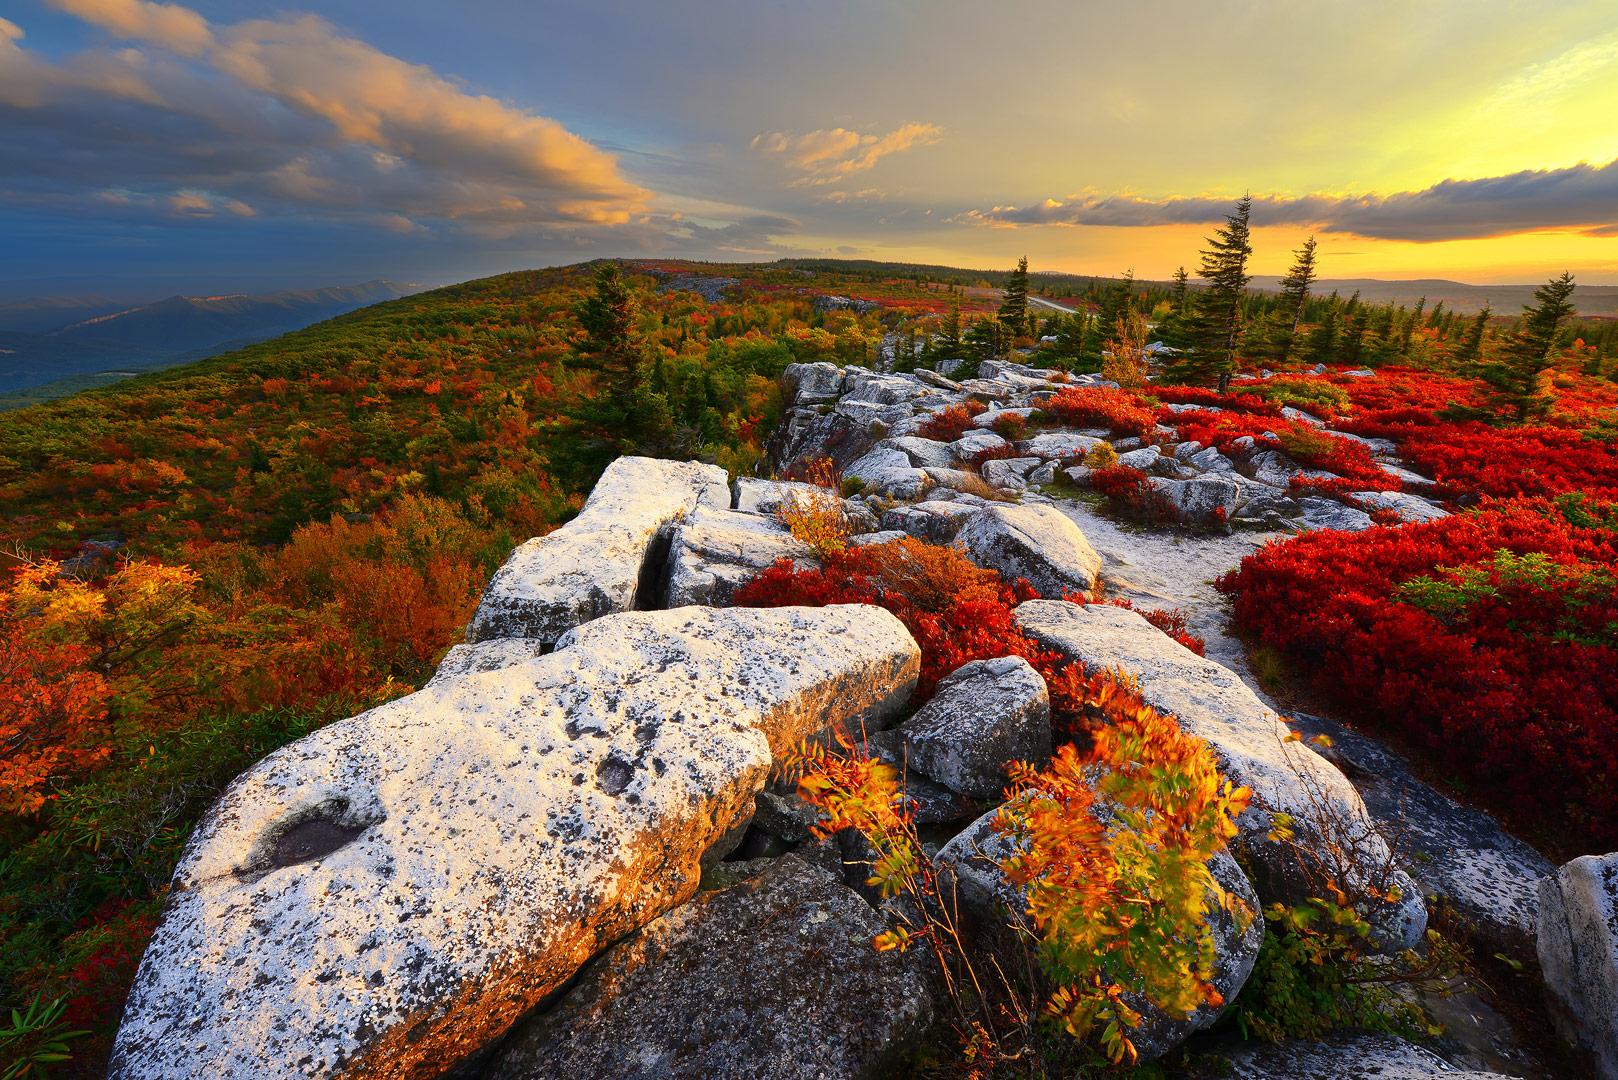 West Virginia, Bear Rocks, Dolly Sods Wilderness, Canaan Valley, Hemlock, Mountain Laurel, Dolly Sods, Allegheny Mountains, Bear...